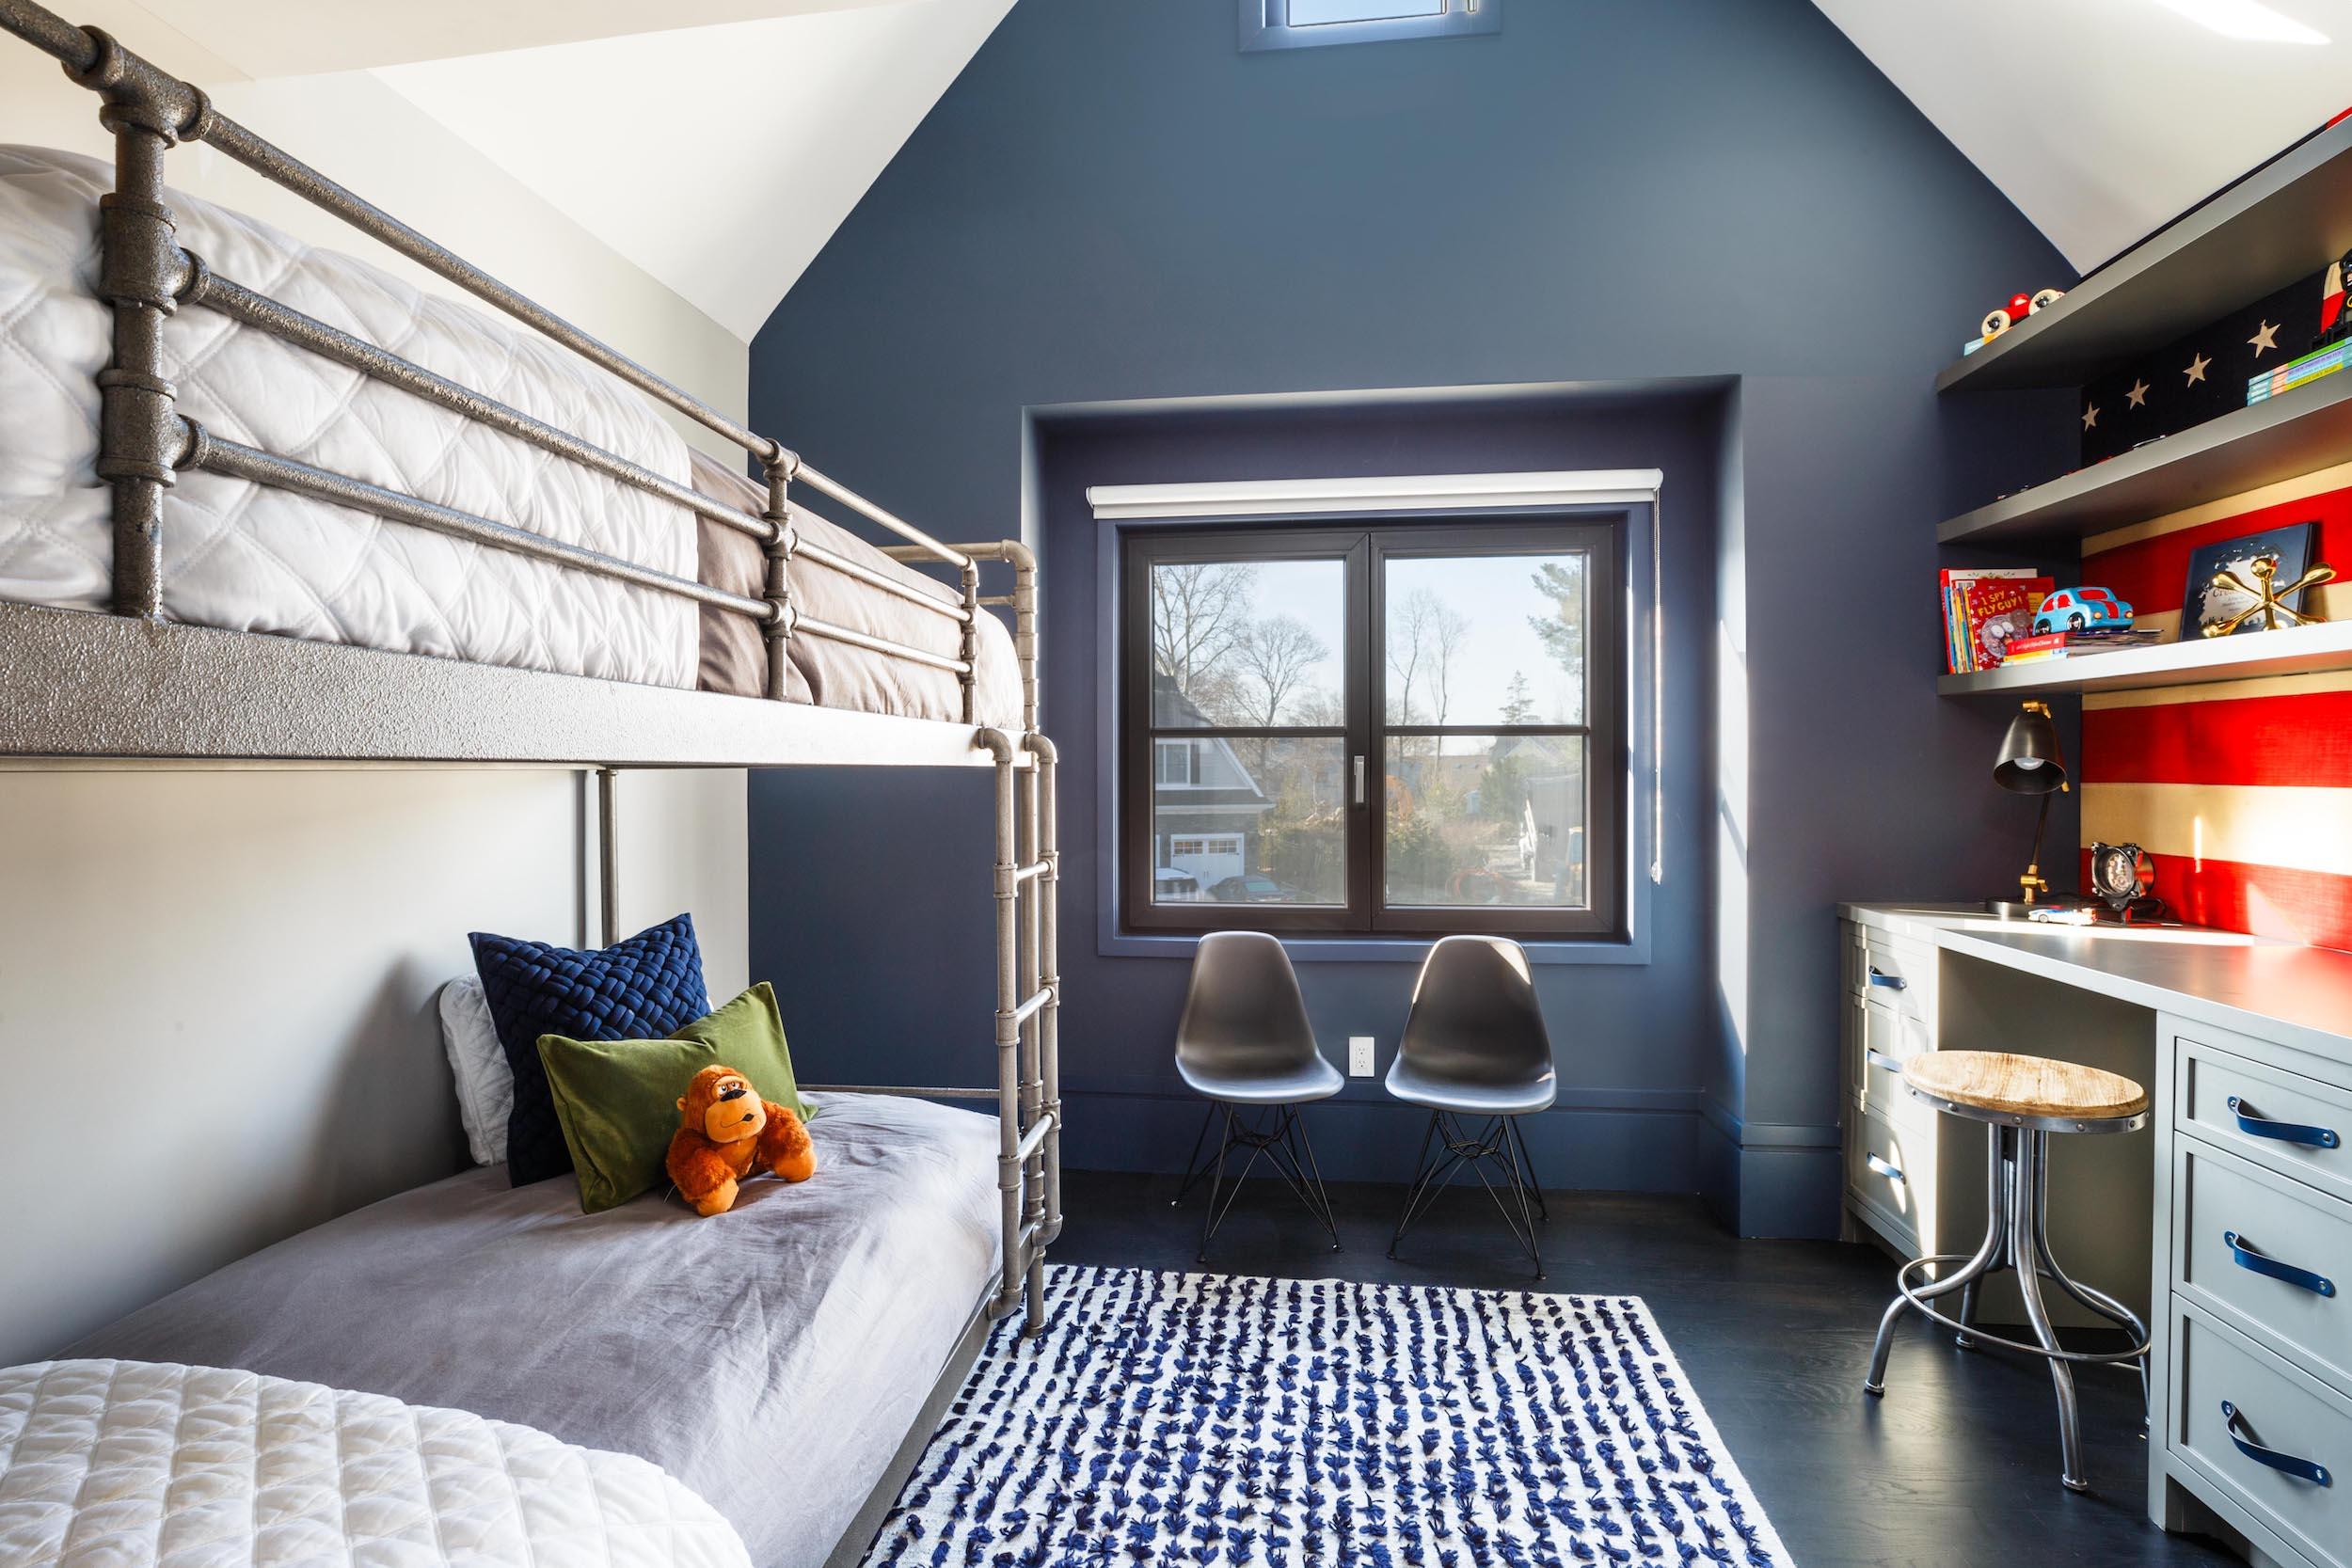 Allie Wood, Allie Wood Design Studio, Interior Designer6_D'Ambrosio_Way-3 Bedroom.jpg